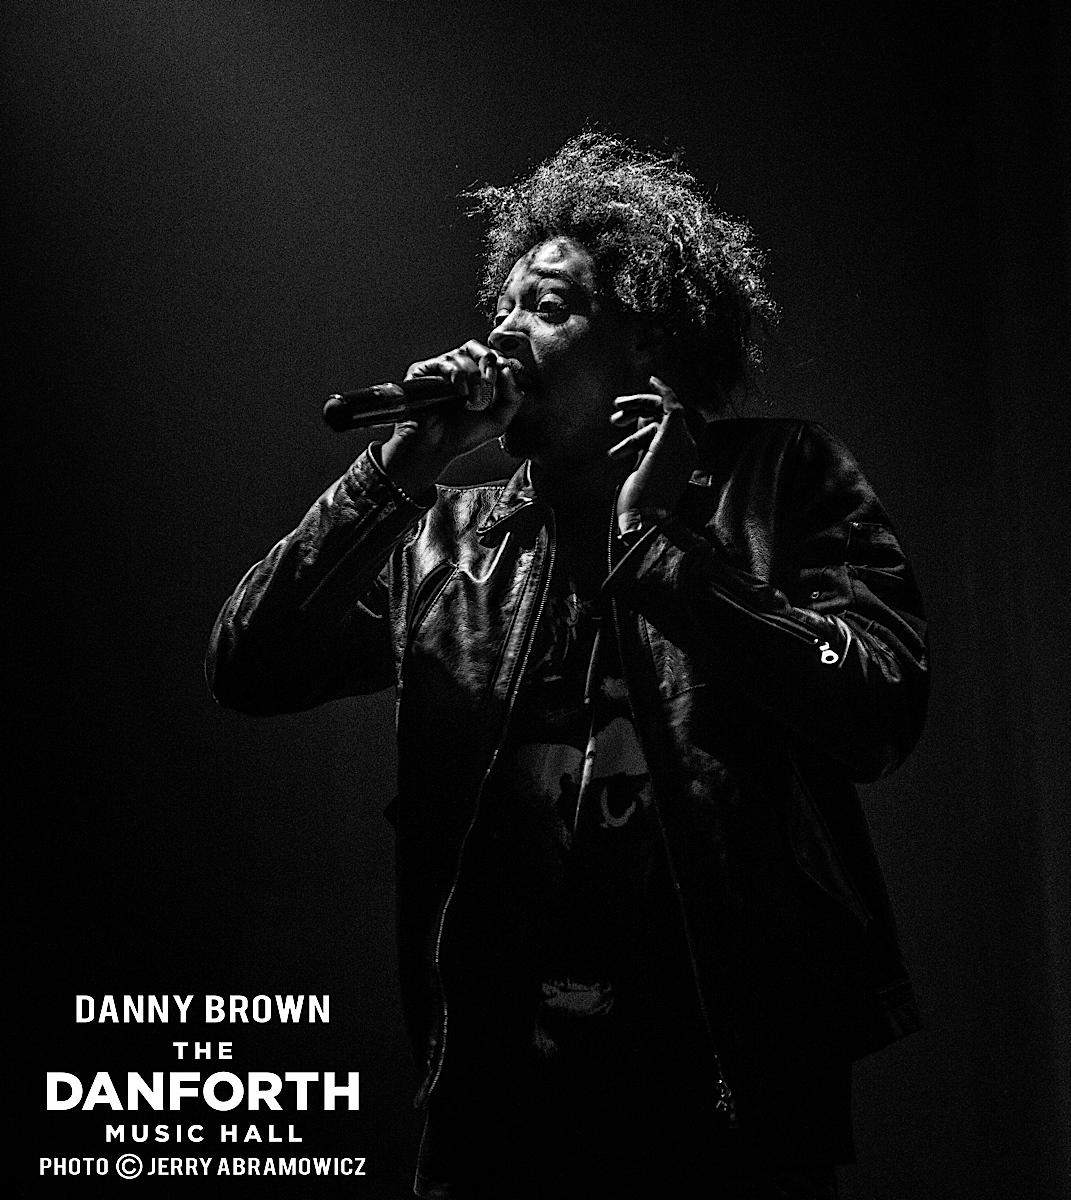 20131001 Danny Brown at The Danforth Music Hall Toronto 0080